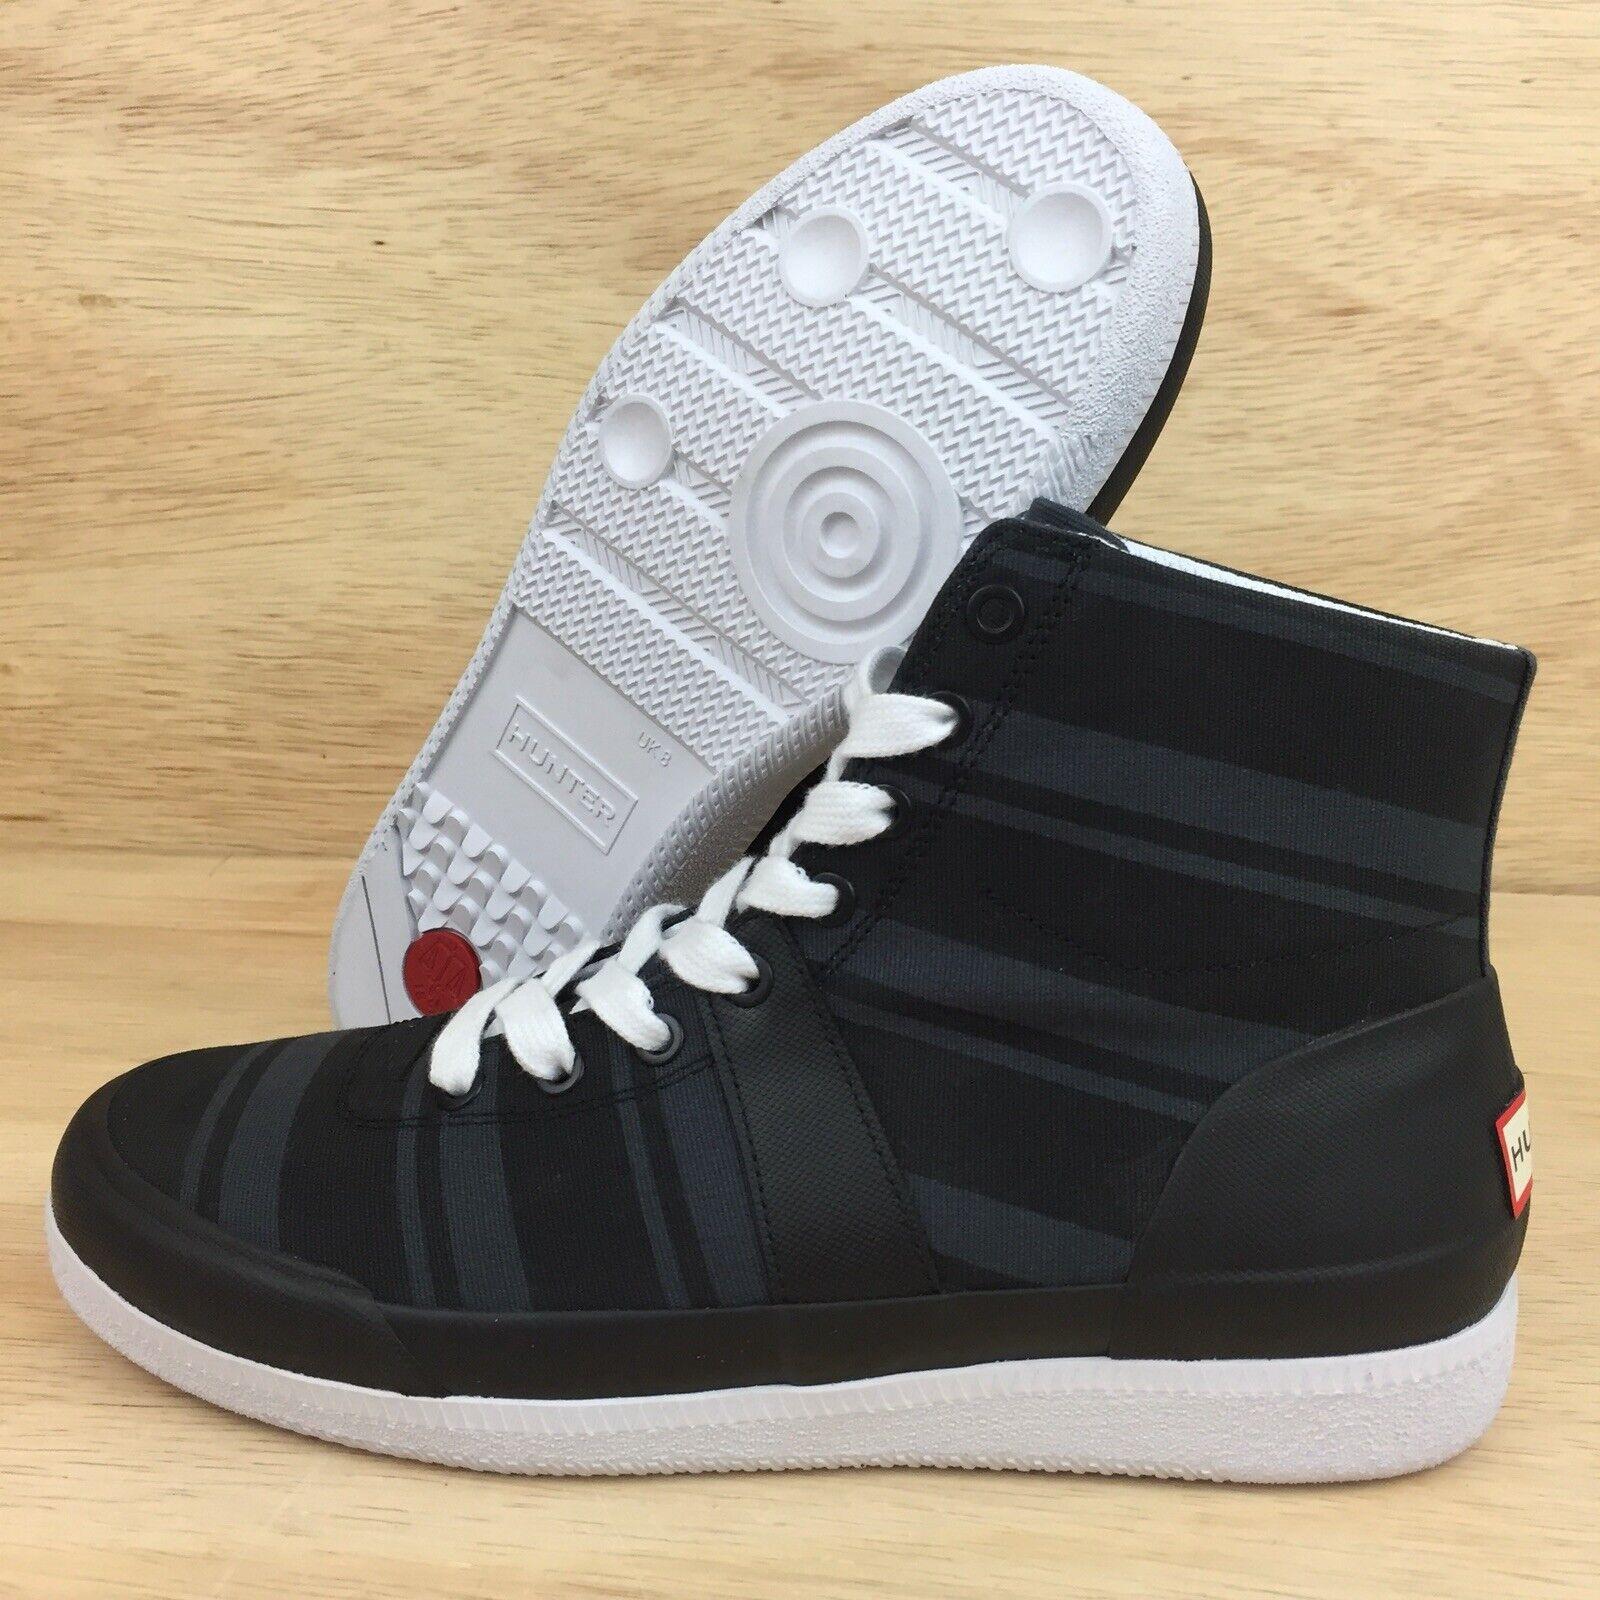 Hunter Original Garden Stripe Hi Top Sneakers Mens SZ 9 Black